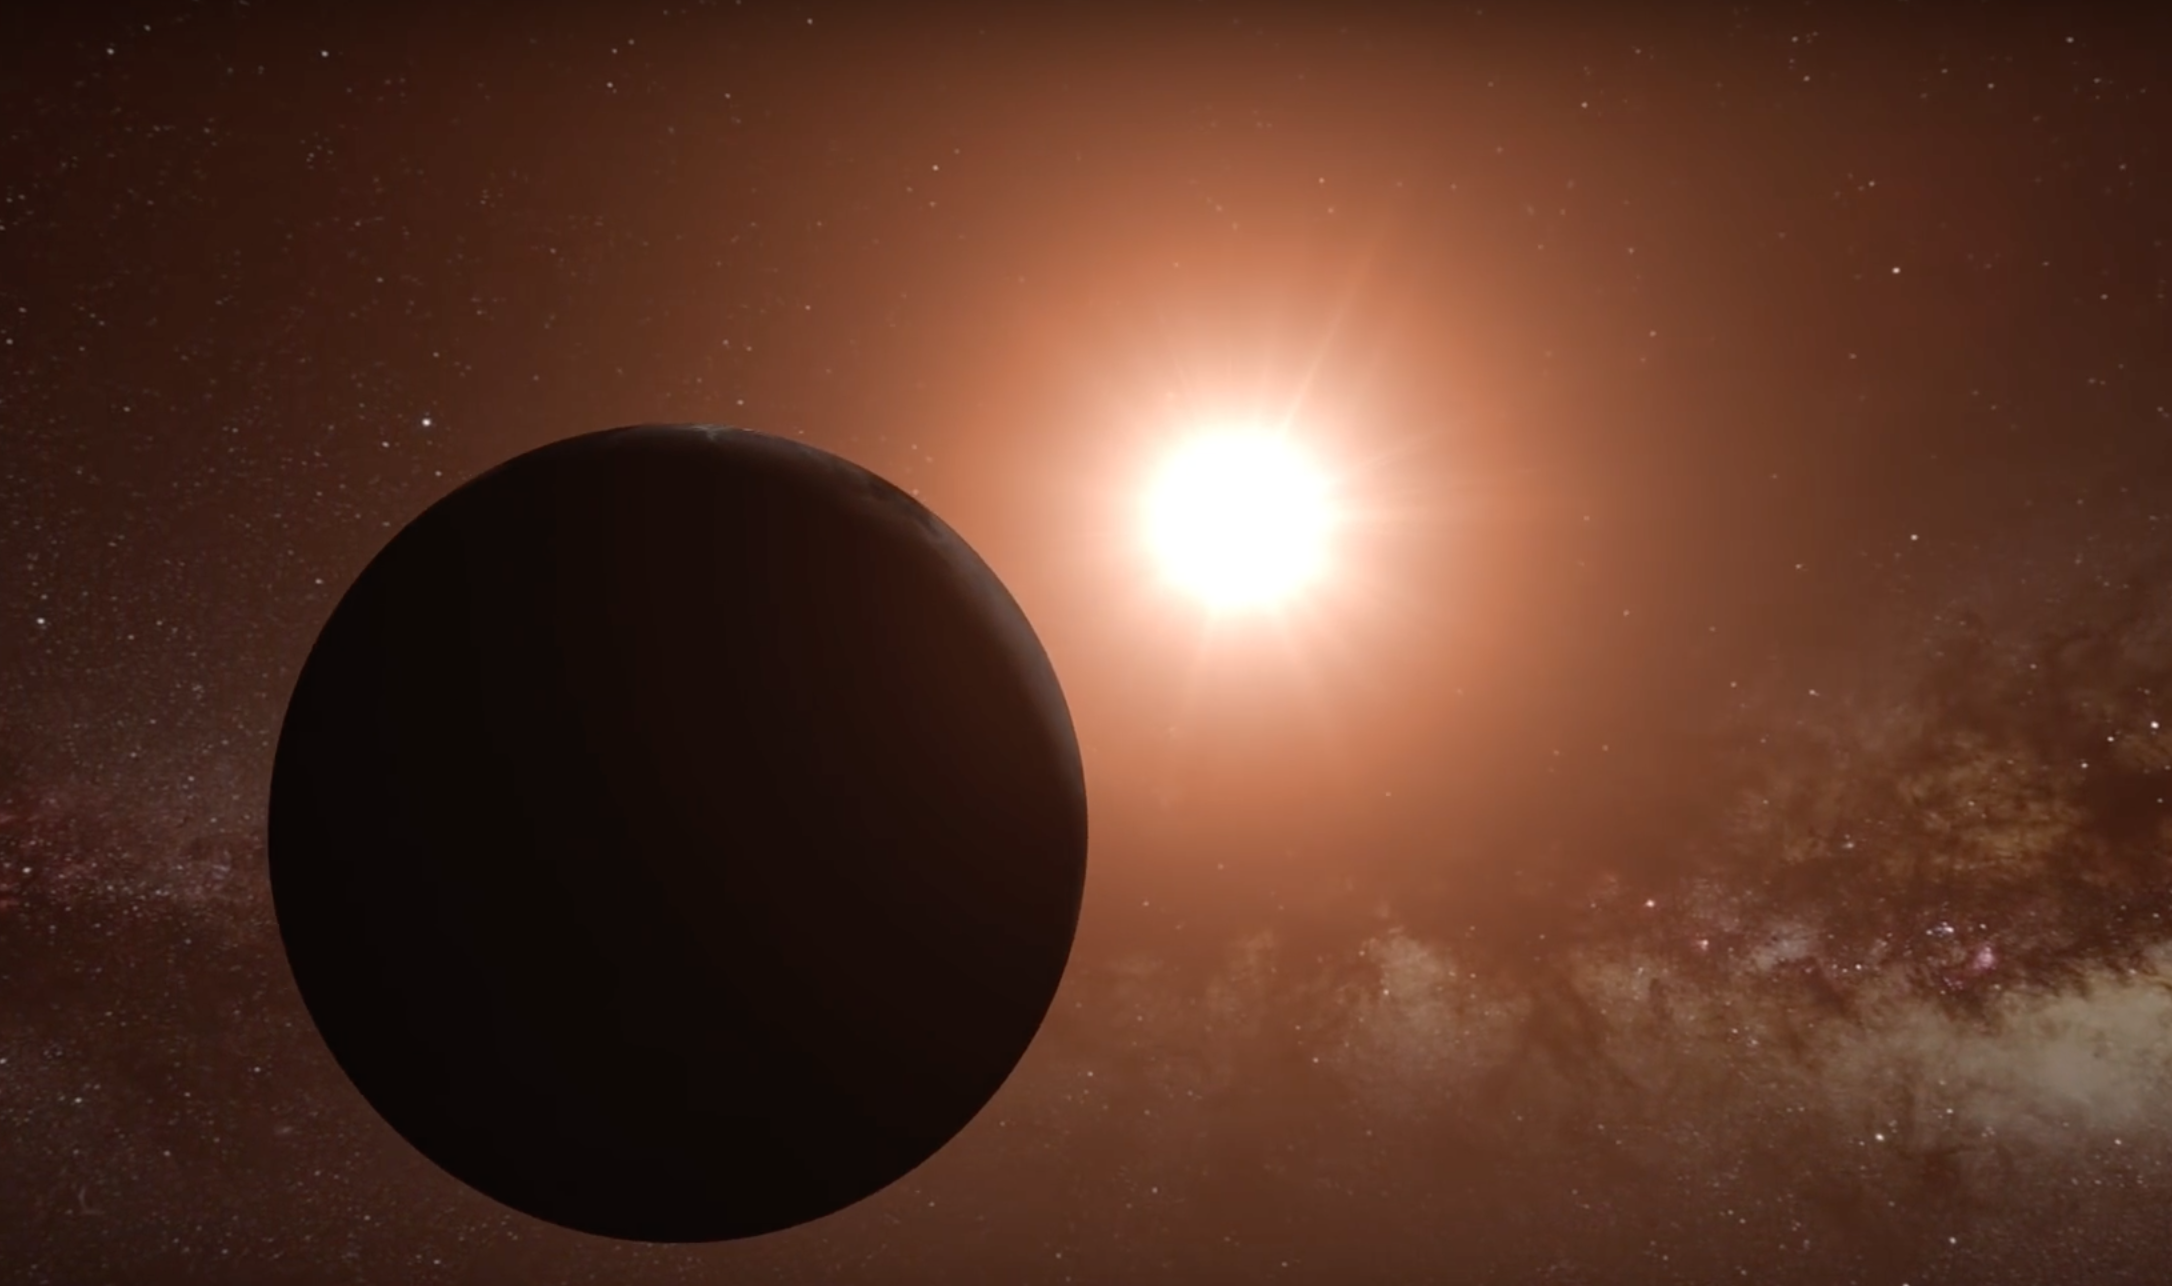 картинки планеты проксима центавра осветлить